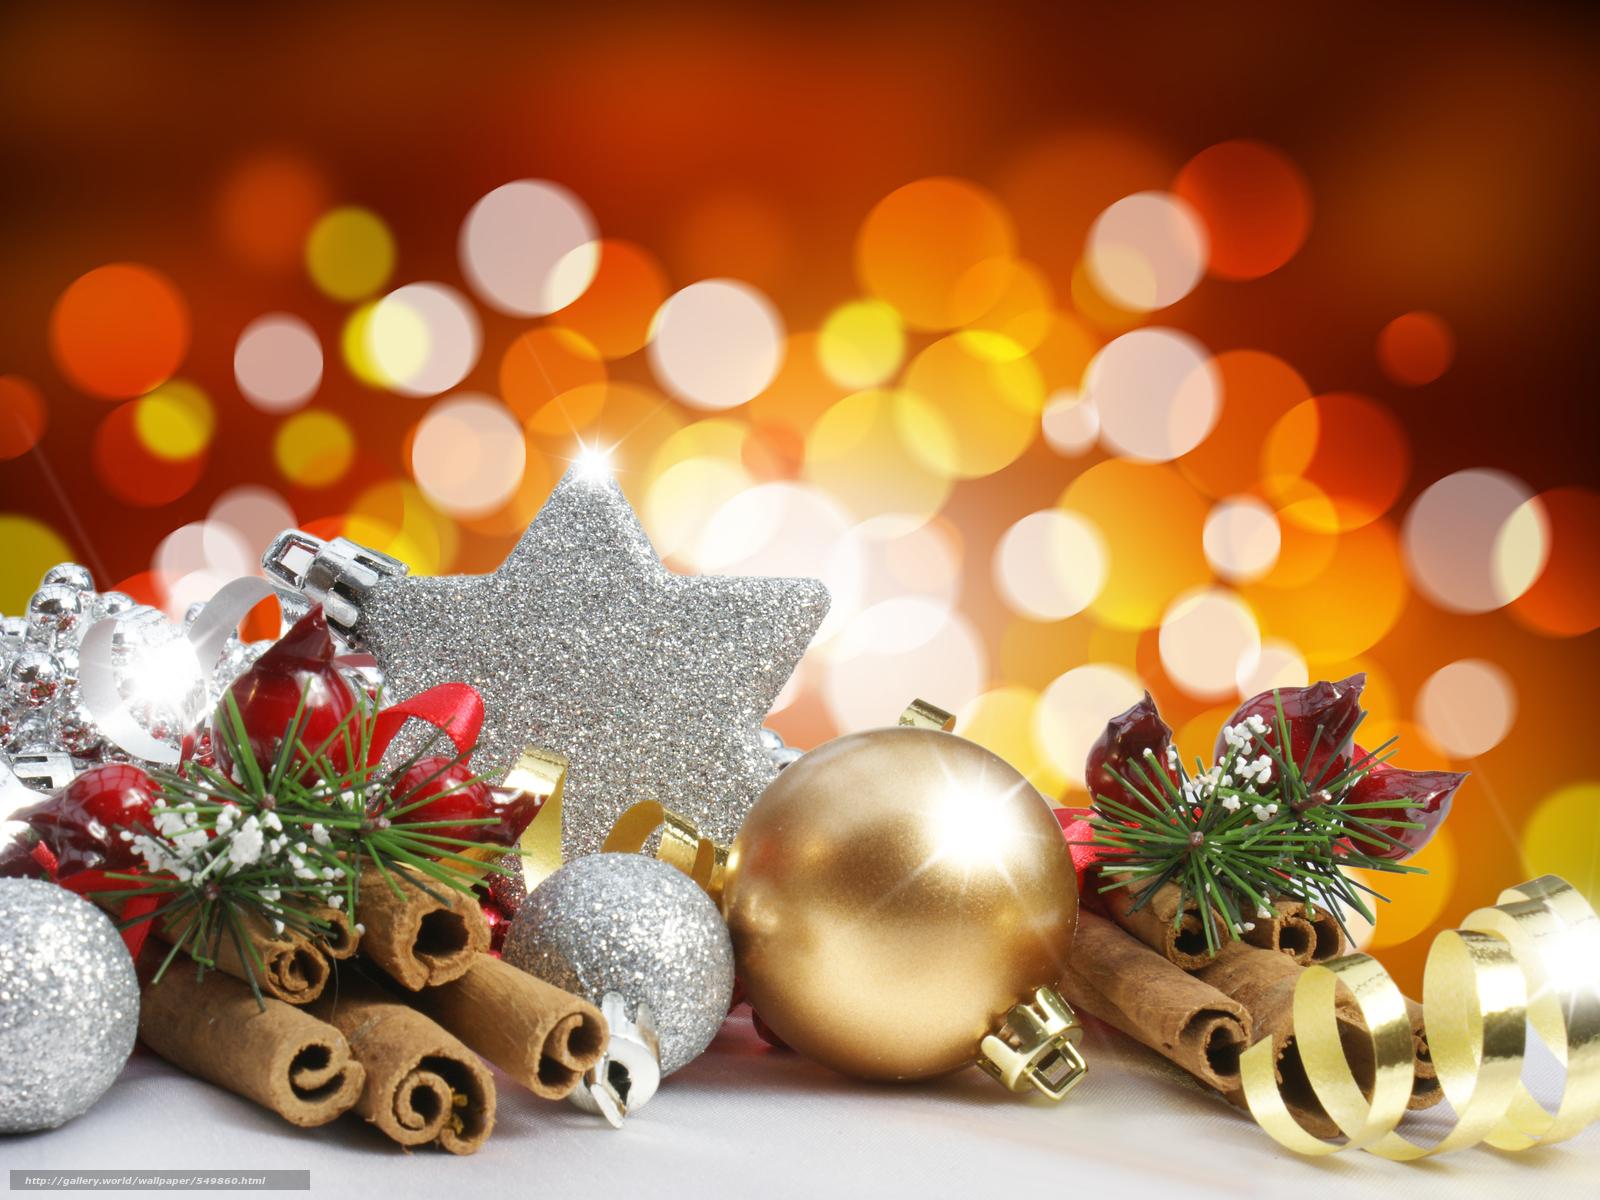 549860_merry_christmas_happy_holidays_new_year_christmas__5324x3993 ...